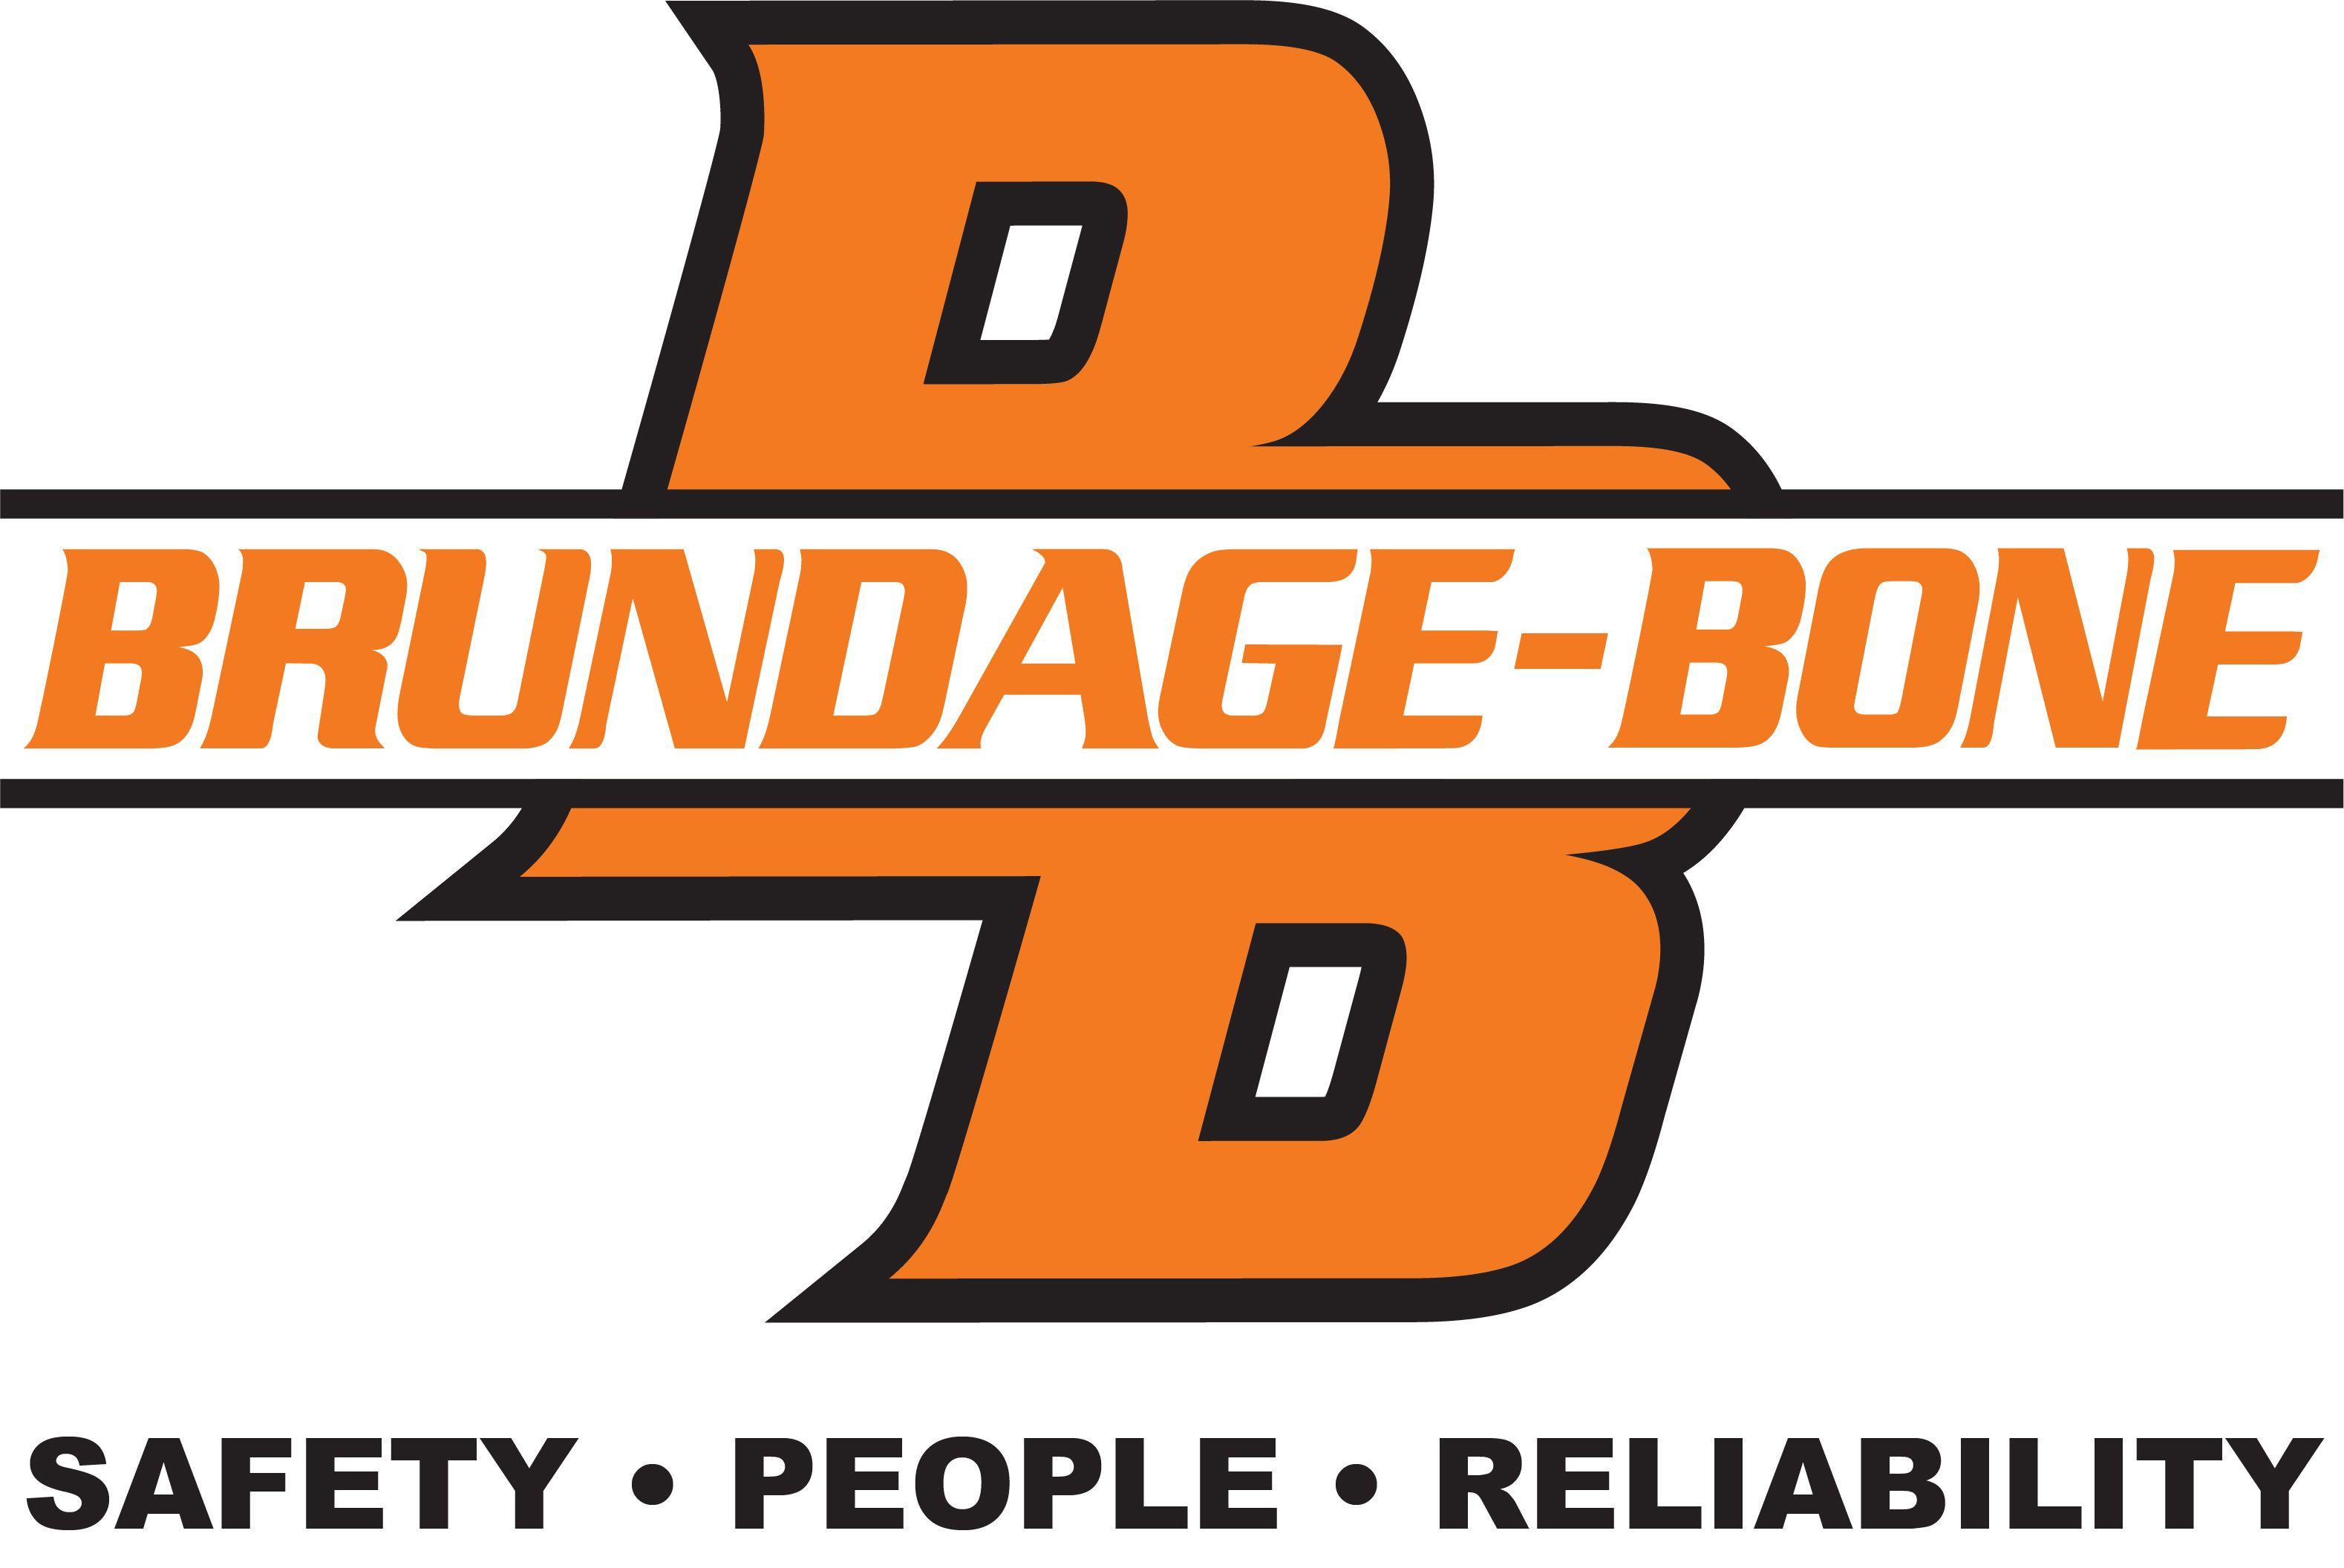 Brundage Bone Concrete Pumping is seeking a highly skilled